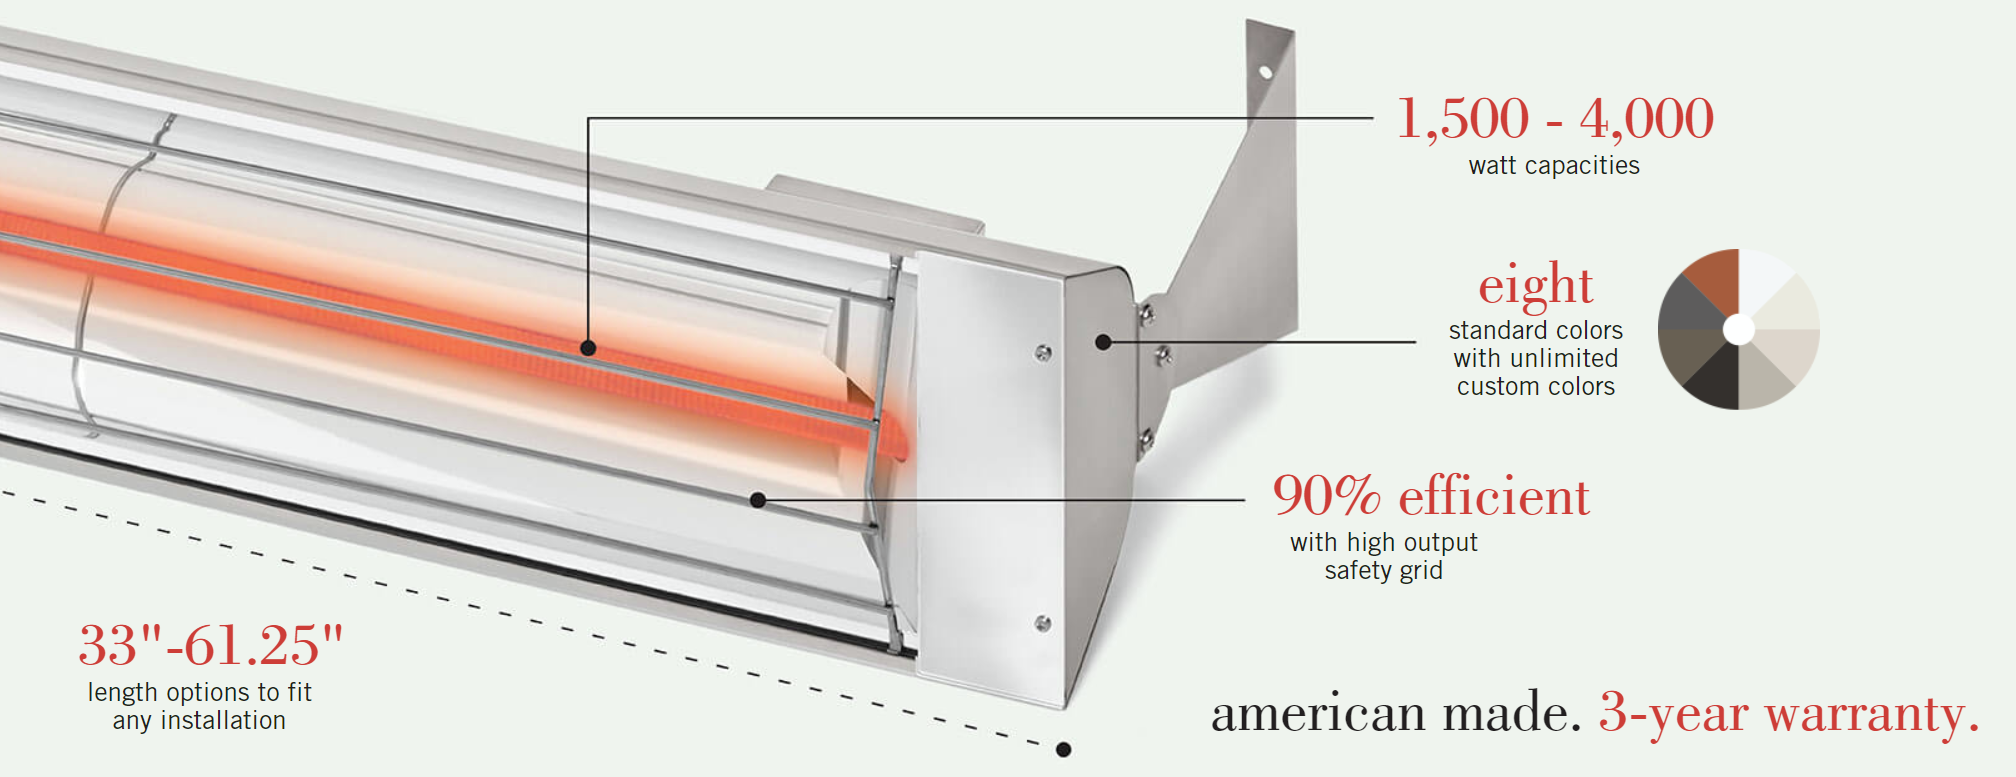 W-Series Infratech Heater